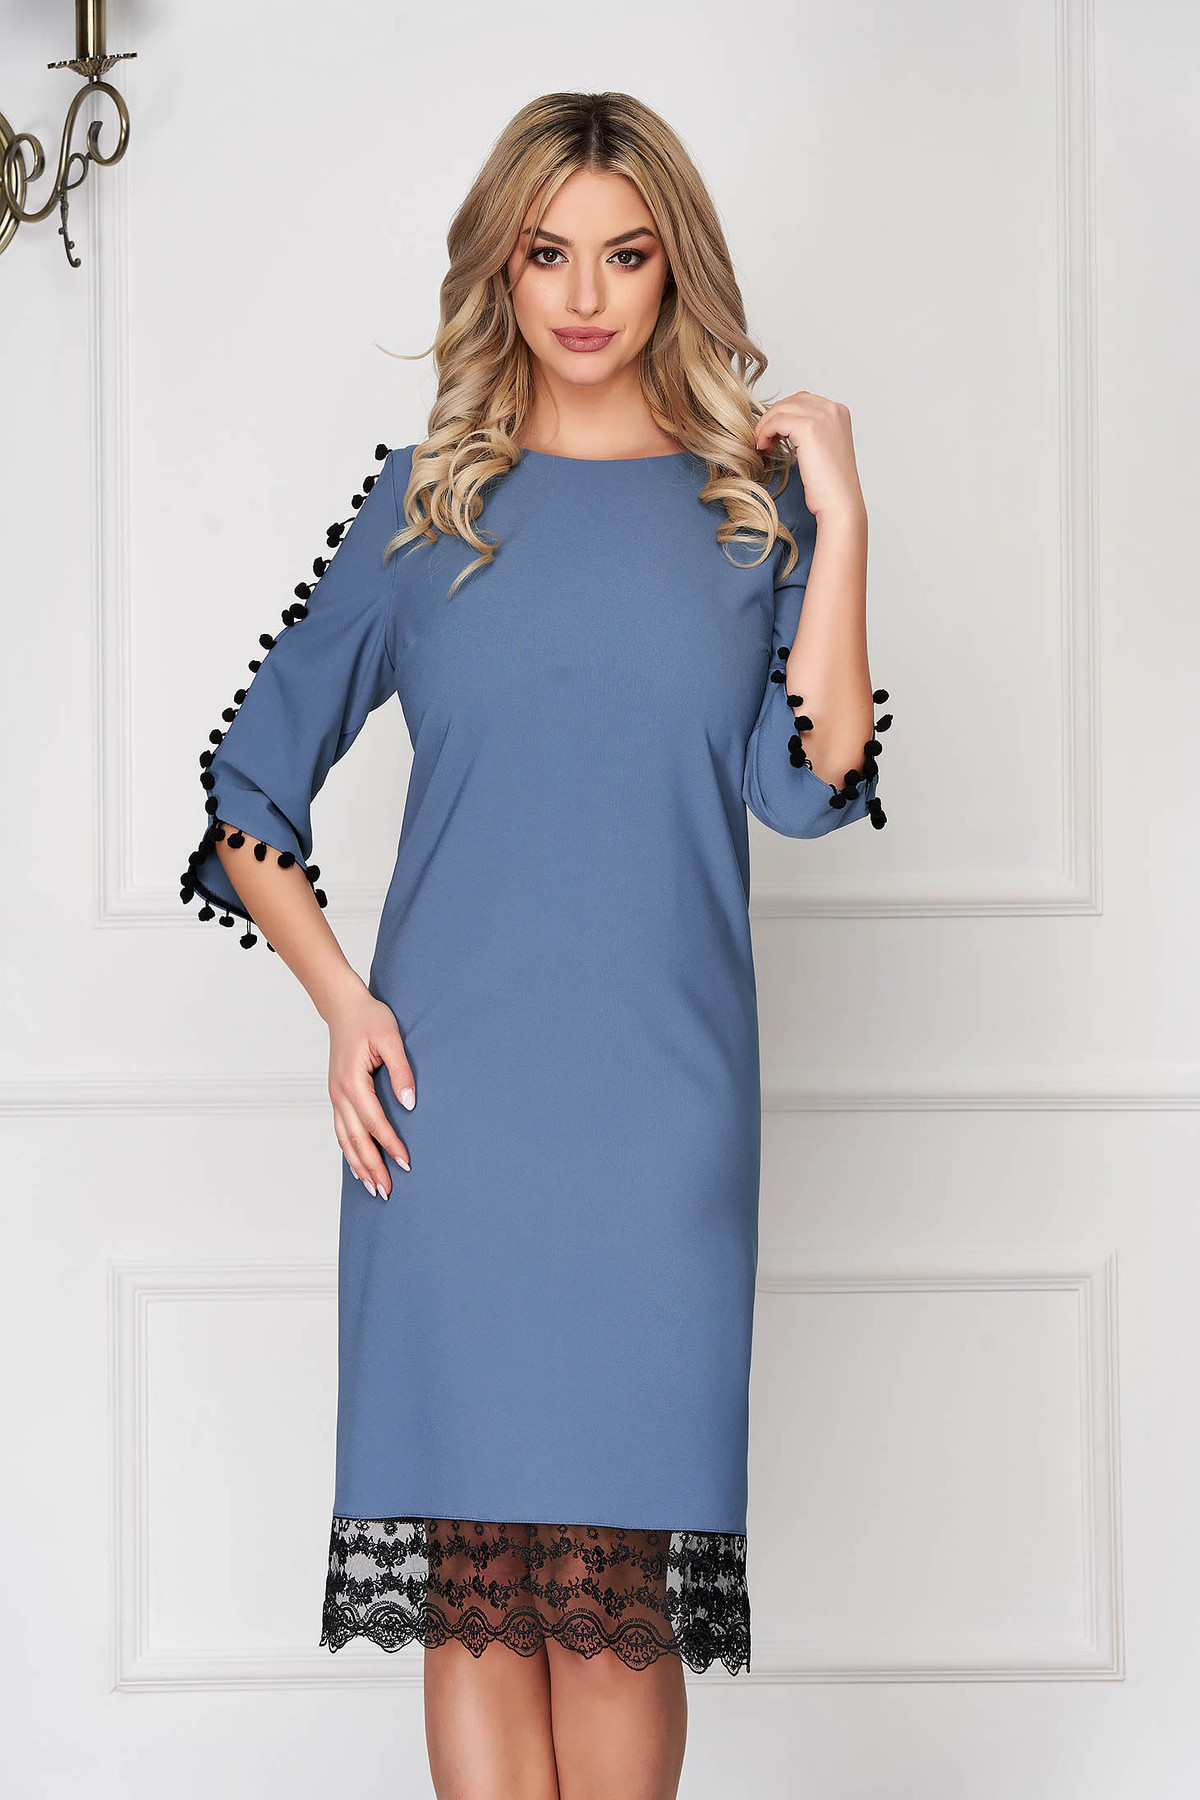 Rochie albastru-deschis eleganta midi cu un croi drept din stofa cu ciucuri si aplicatii de dantela